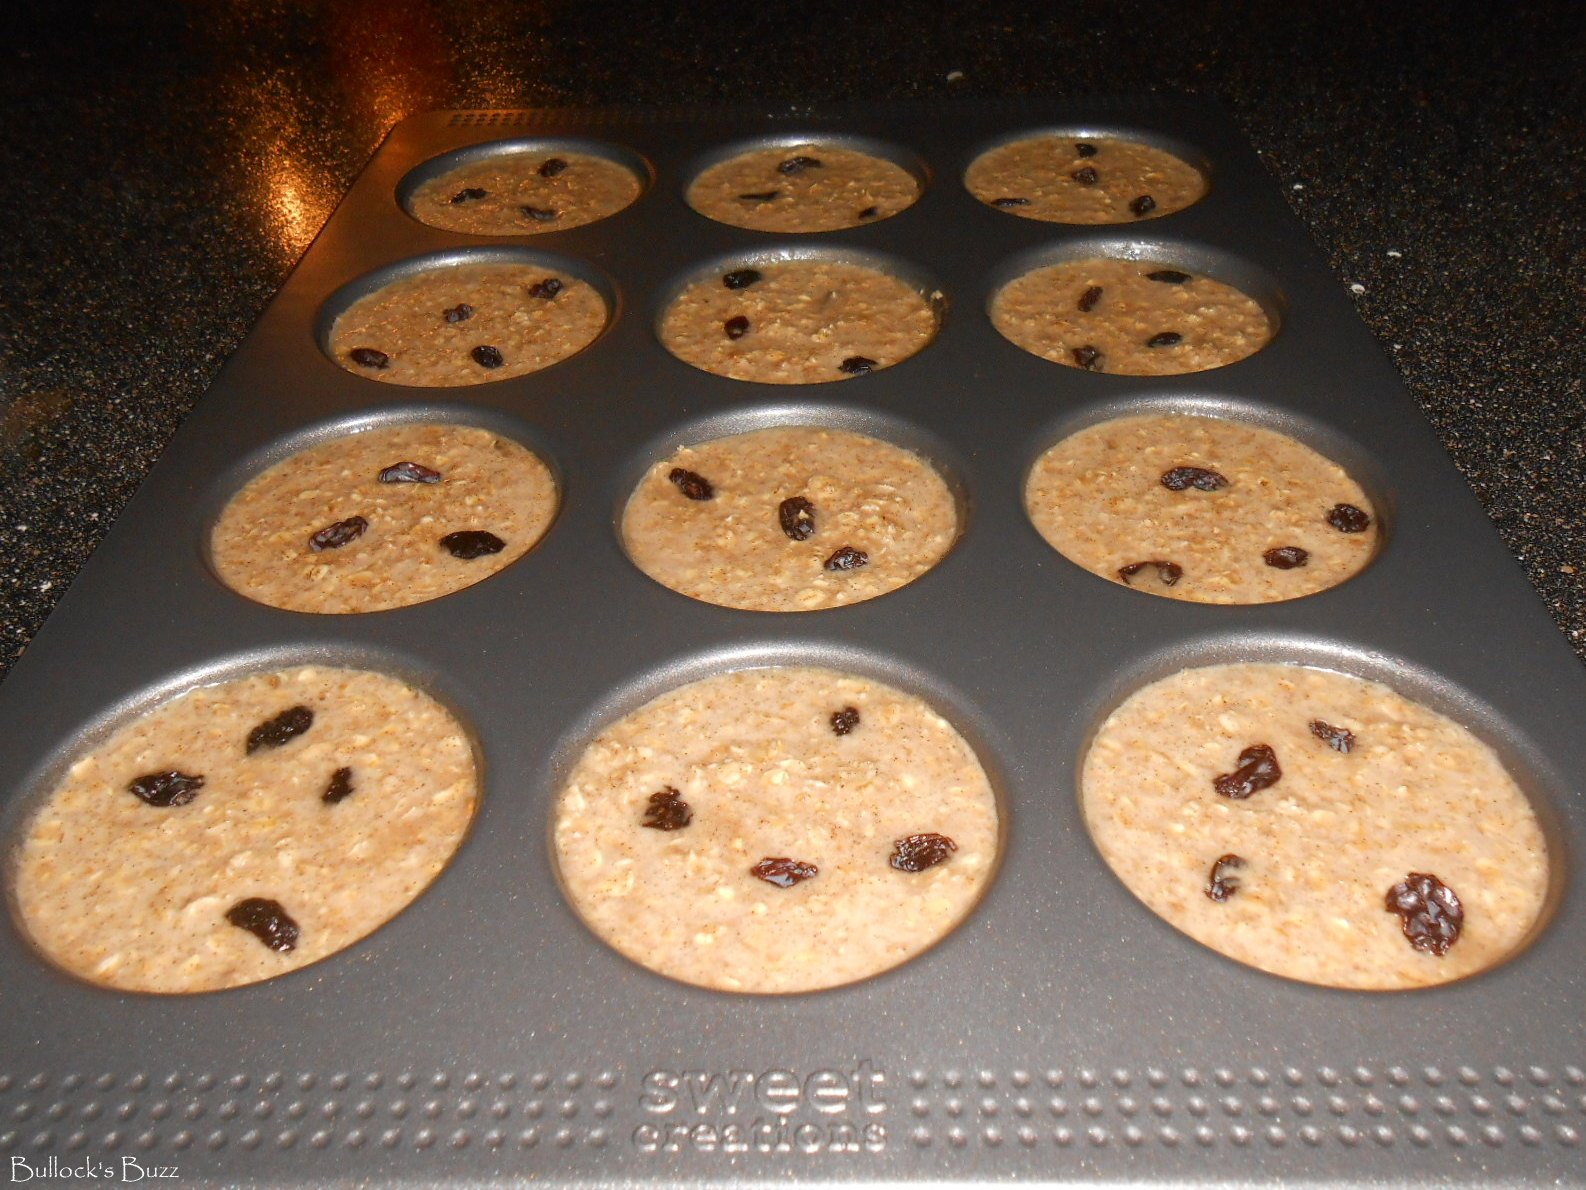 Cinnamon Raisin Baked Oatmeal Whoopie Pie Style – Good Cook Sweet Creations